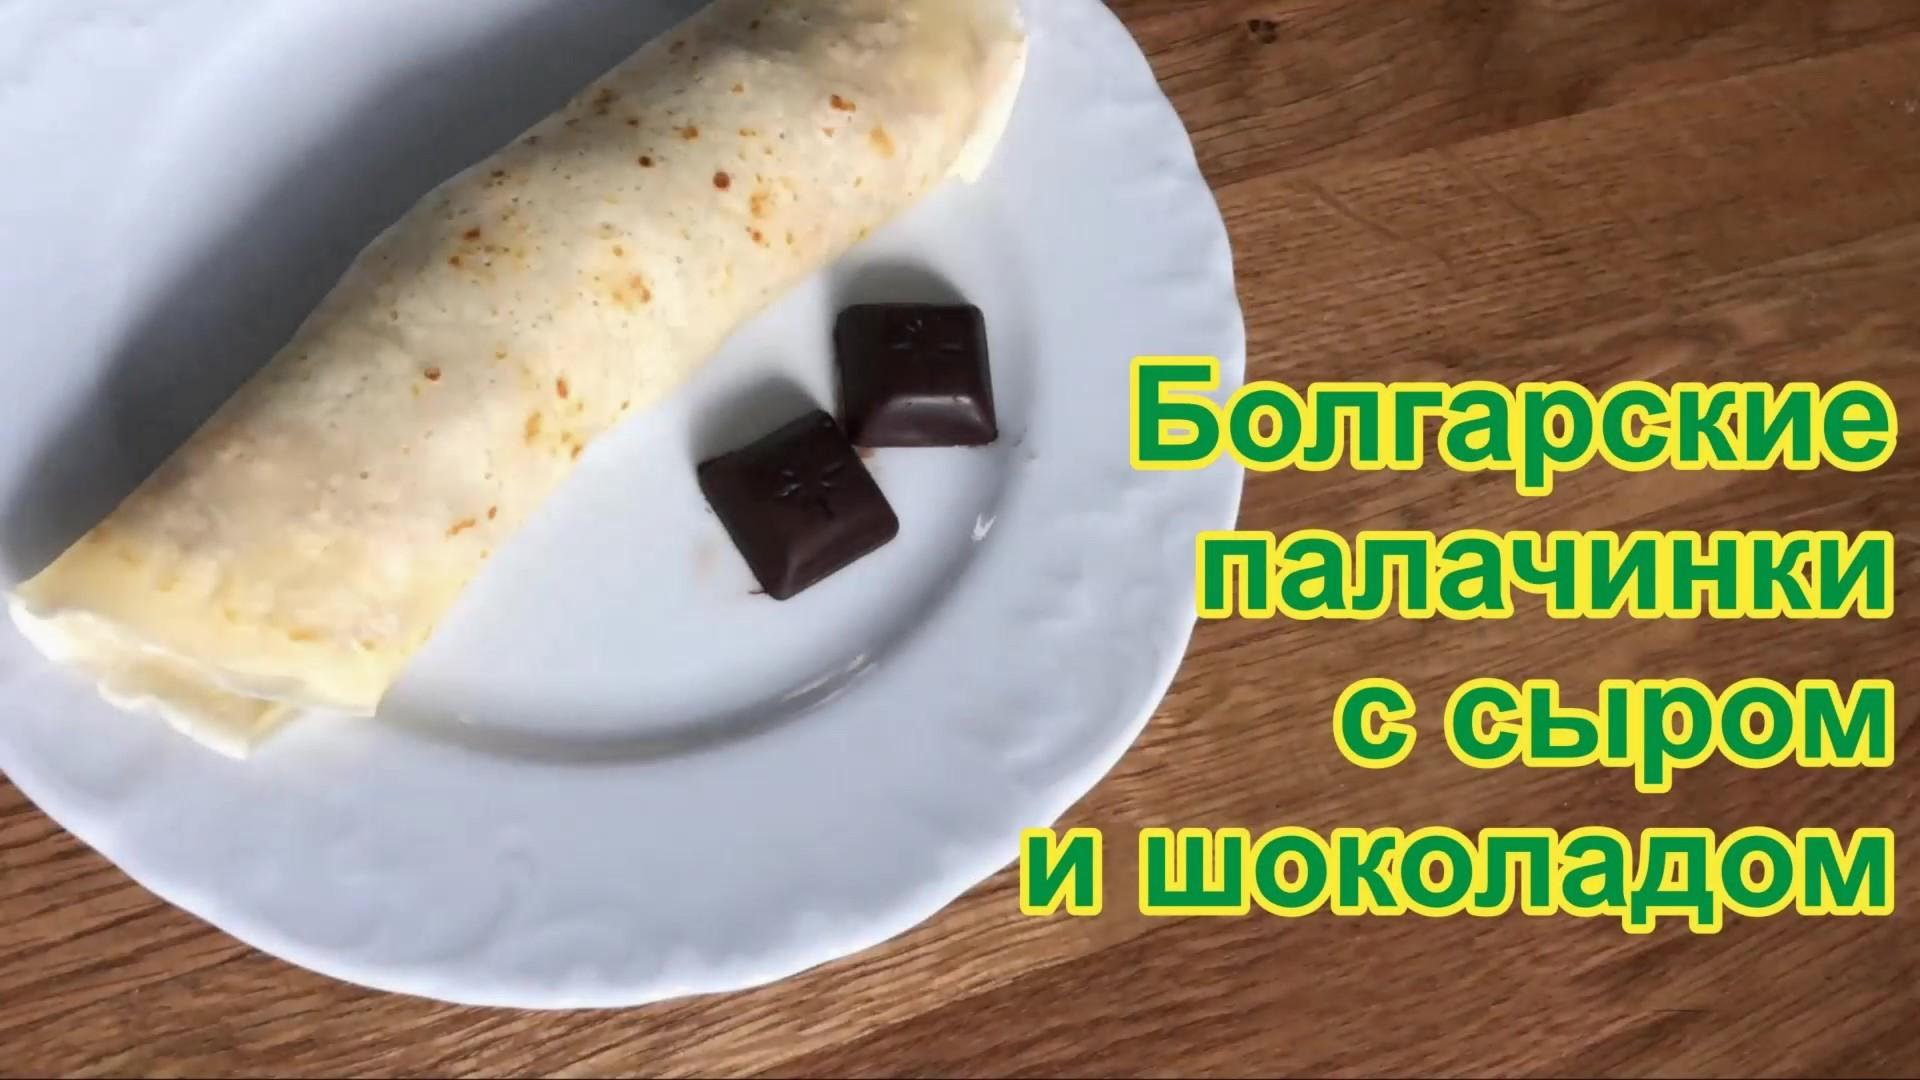 Болгарские палачинки